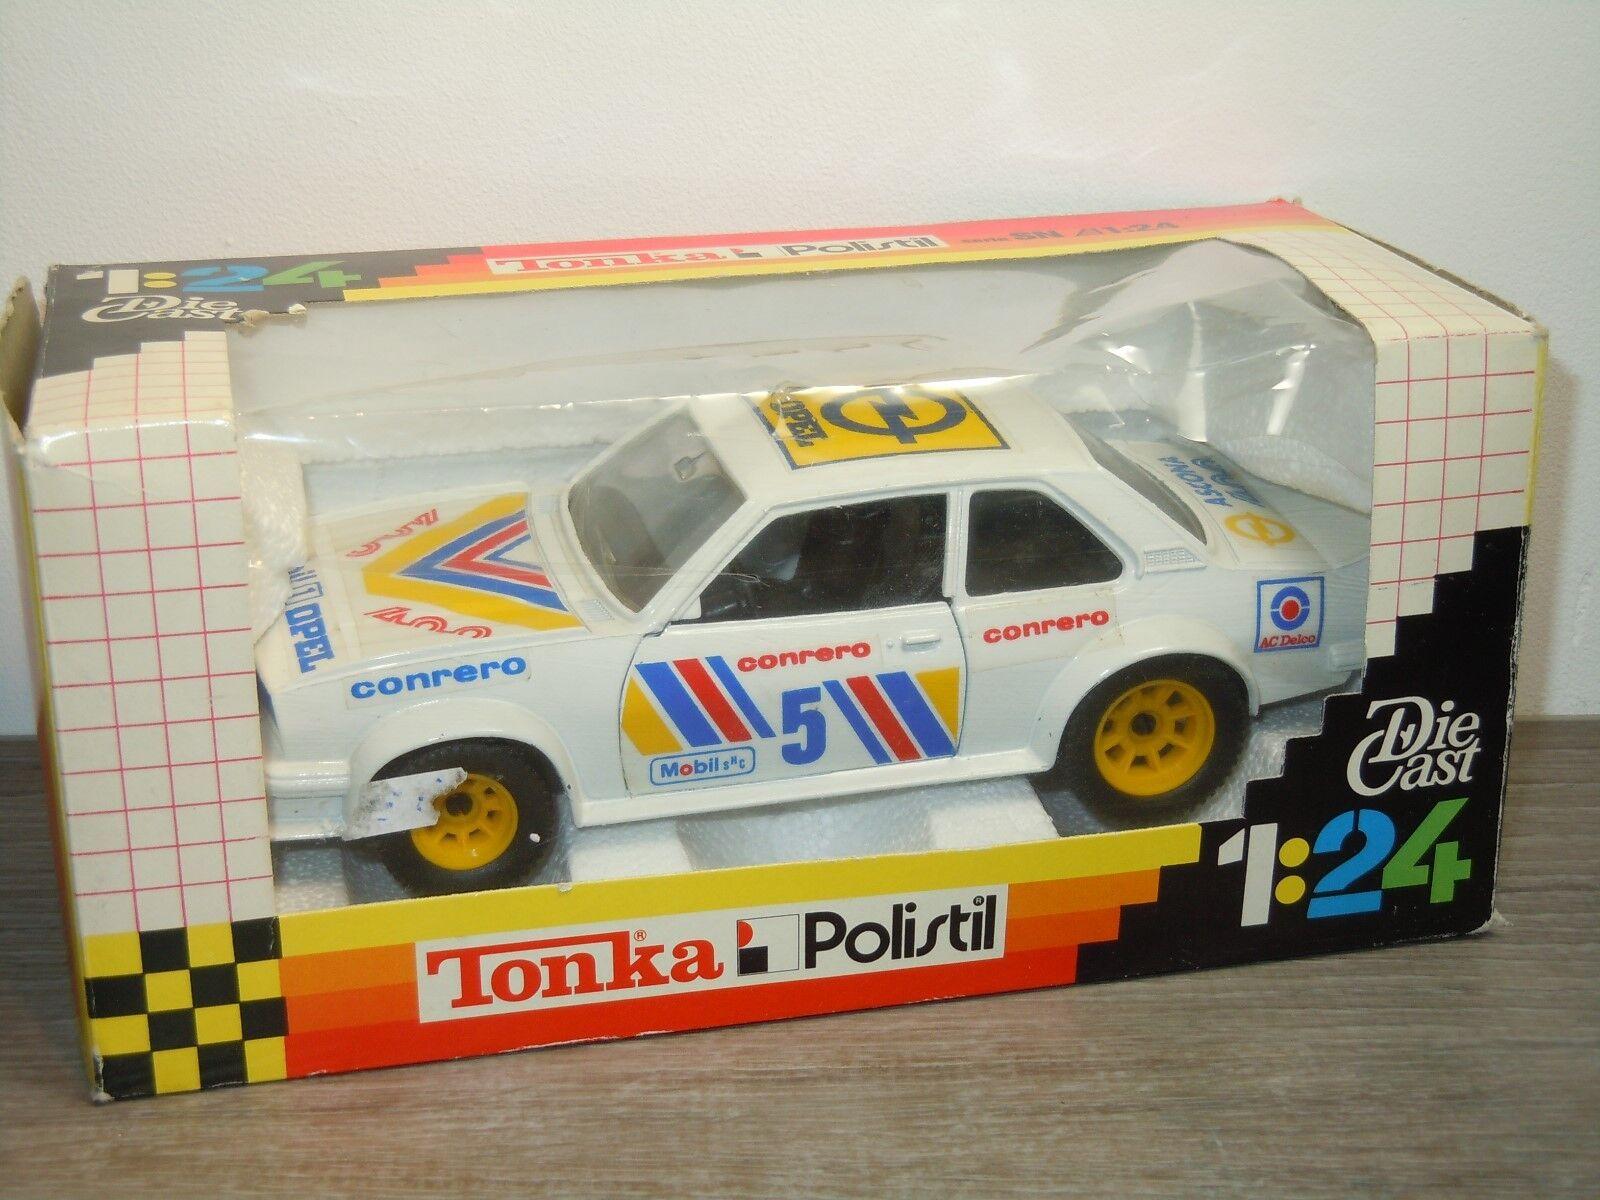 Opel Ascona - Tonka Politil Italien 1 24 i låda 32646